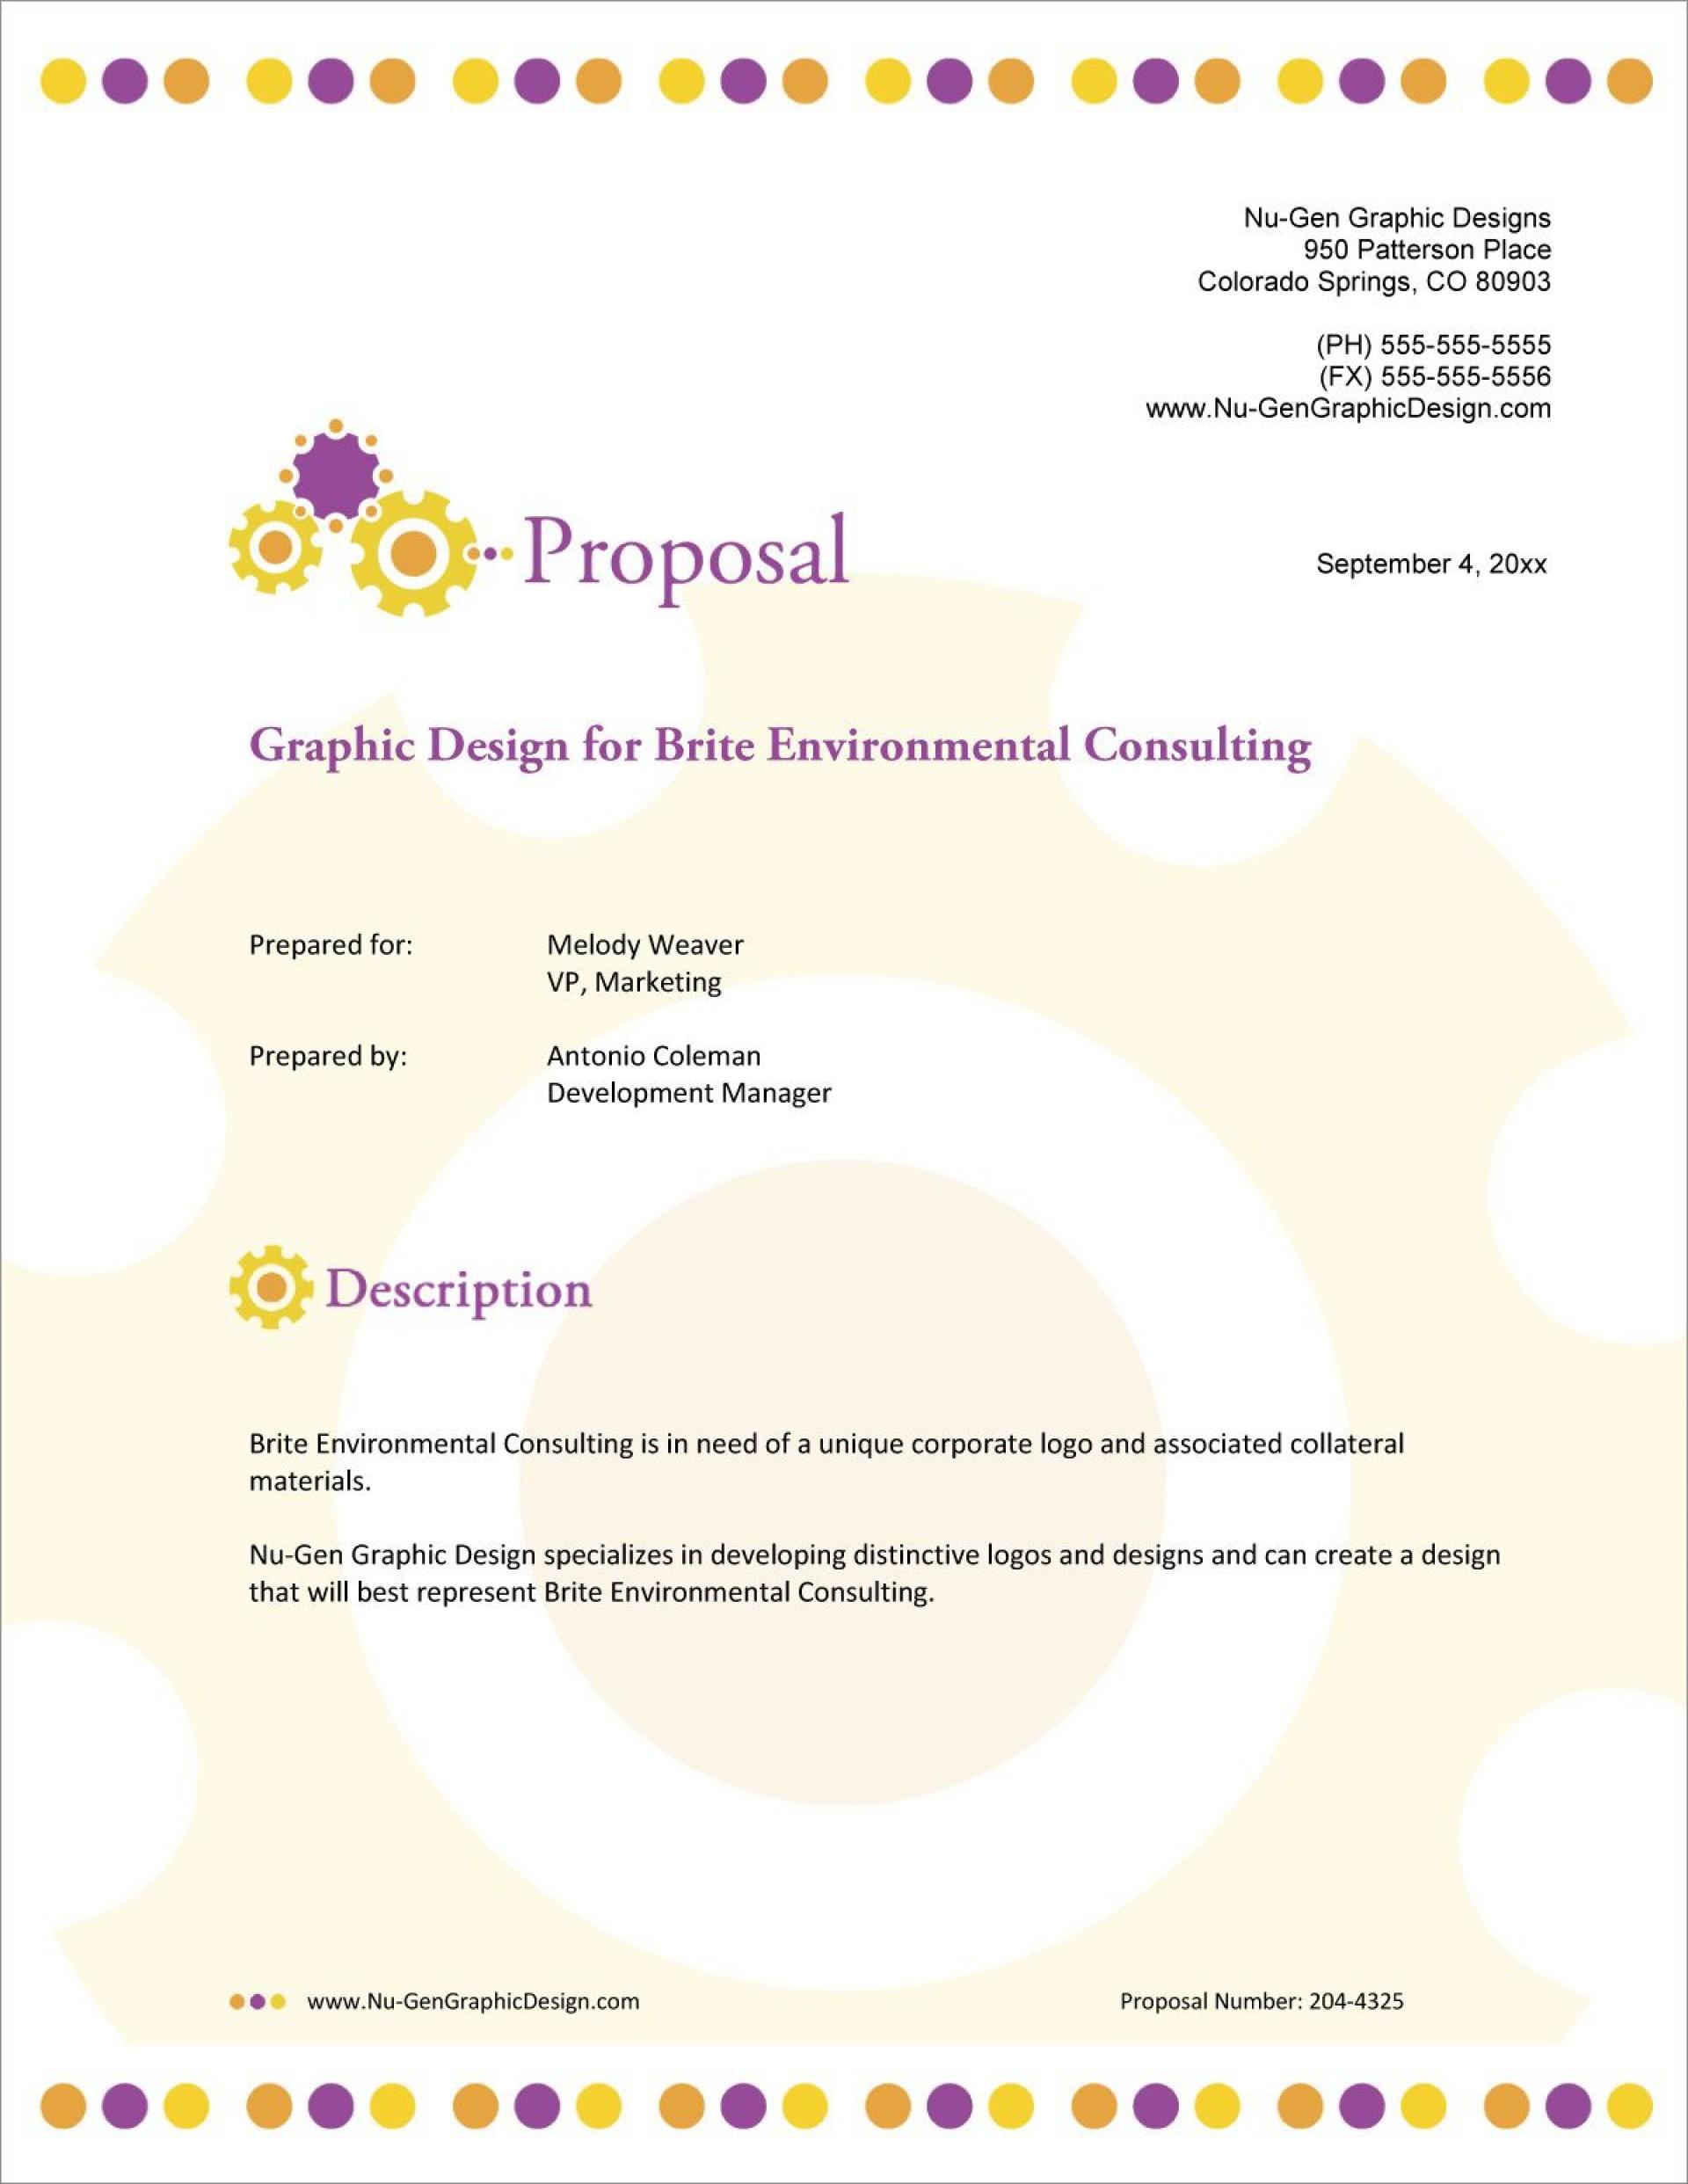 002 Unique Graphic Design Proposal Template Free High Def  Freelance Pdf Indesign1920